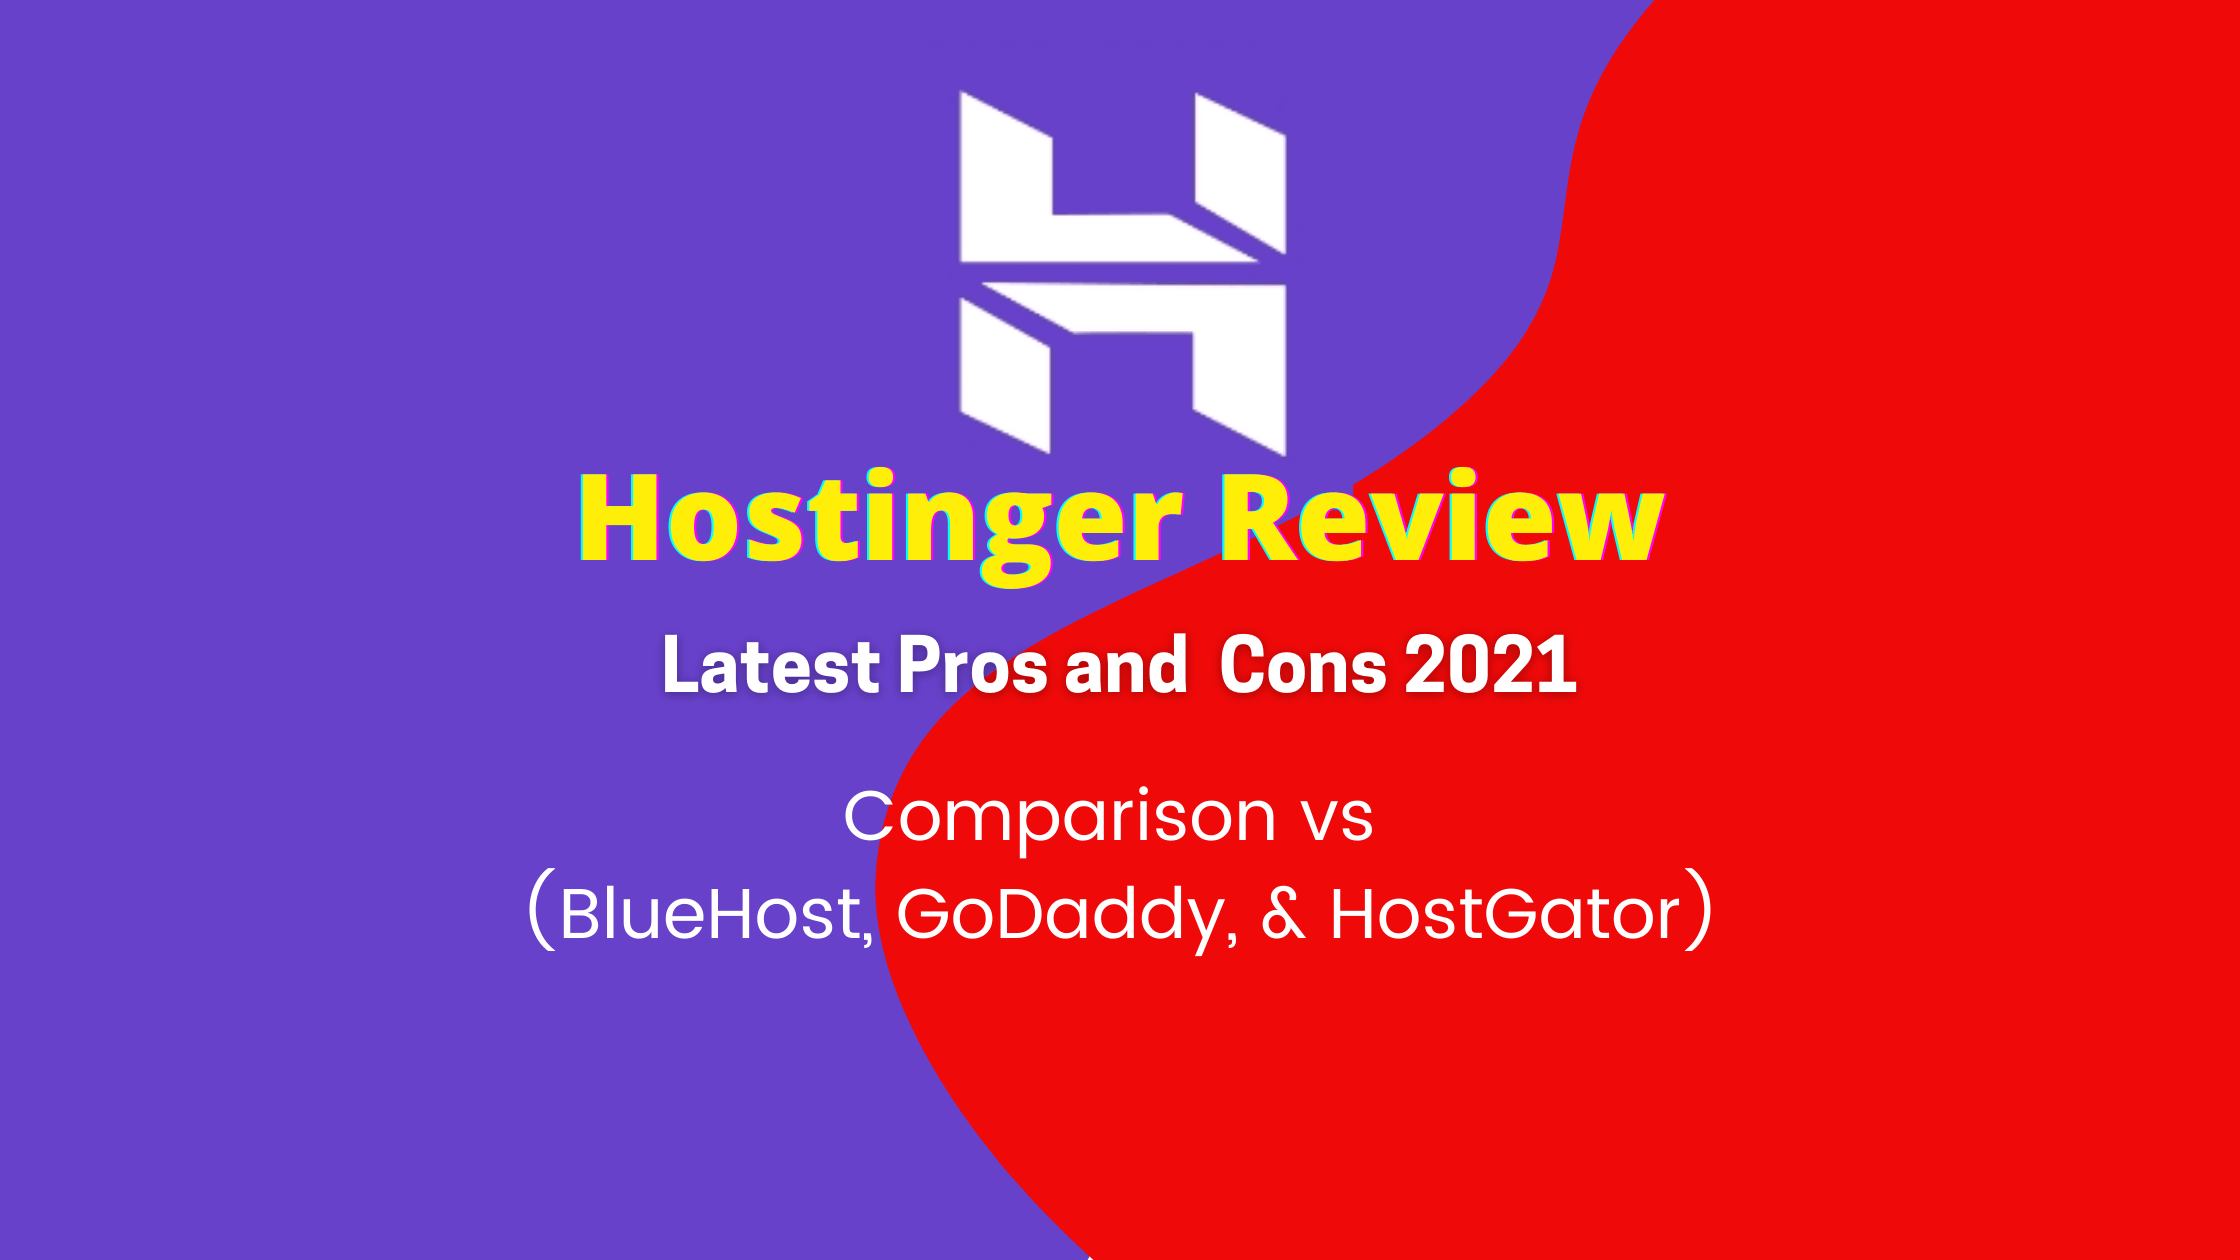 Hostinger Review Pros and Cons 2021